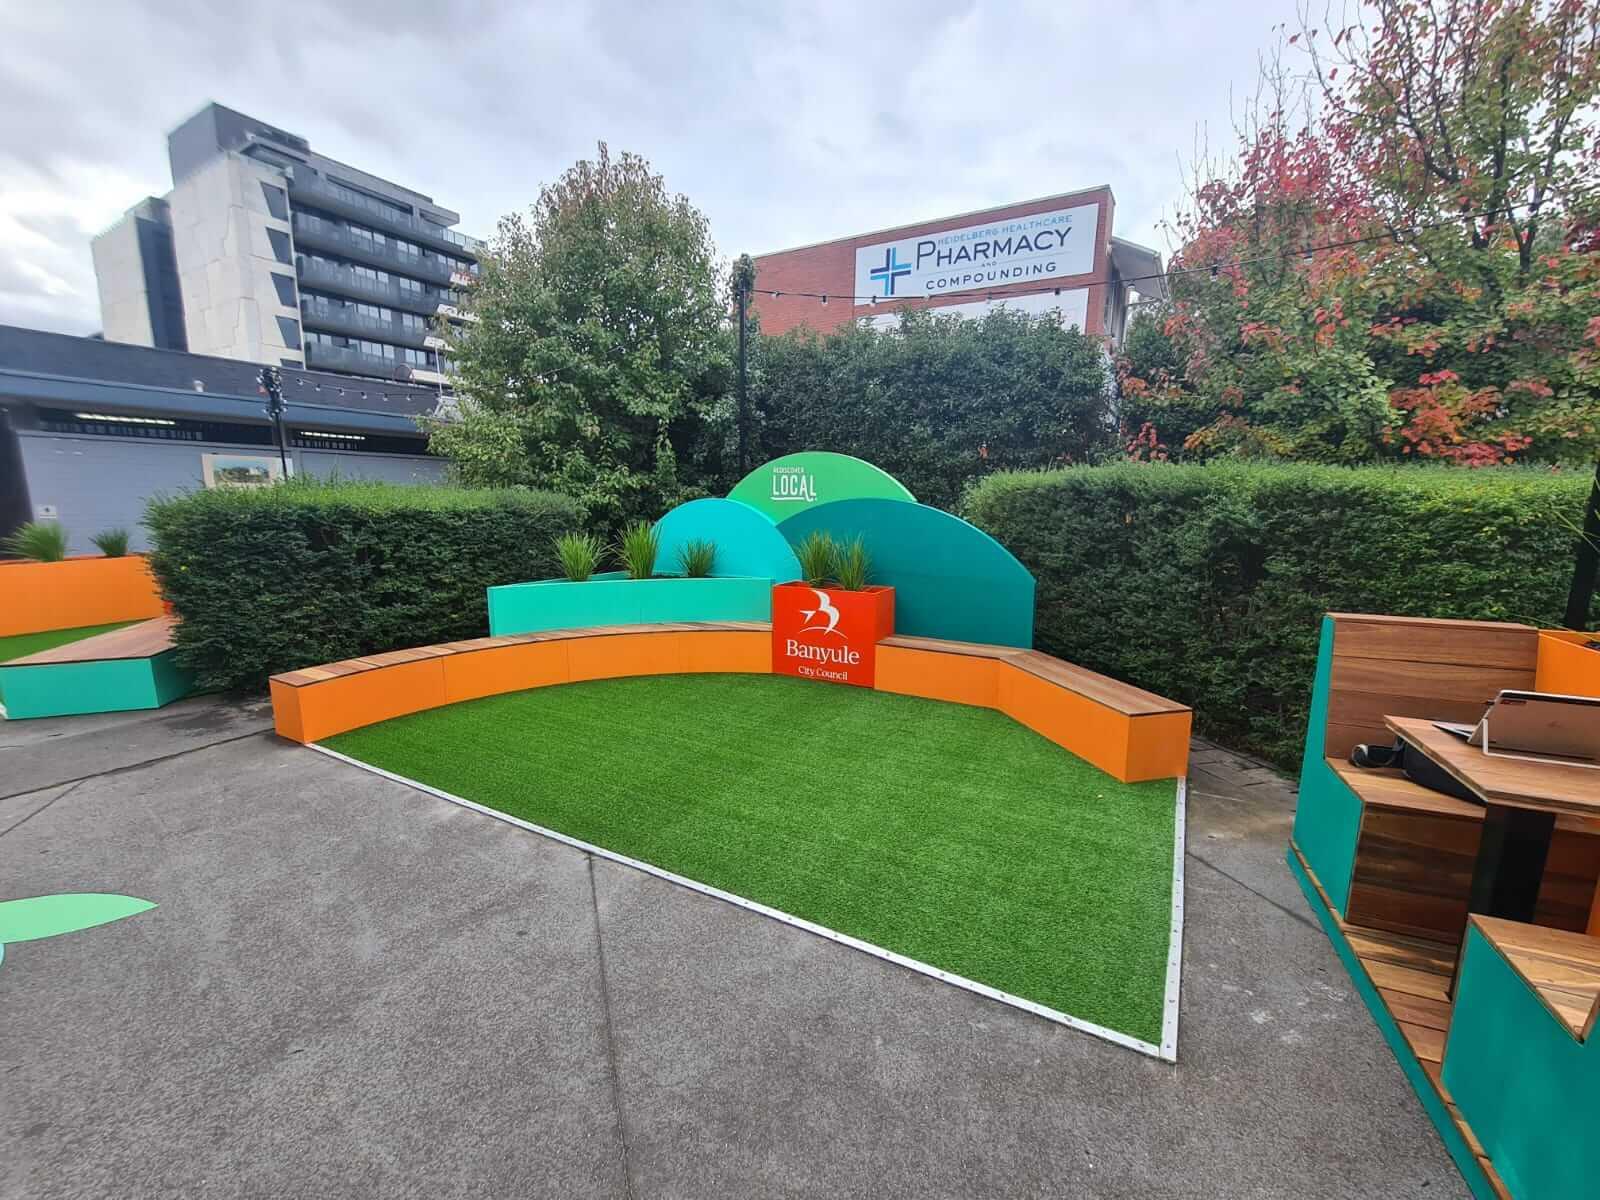 Banyule Council Pop Up Park - Placemaking